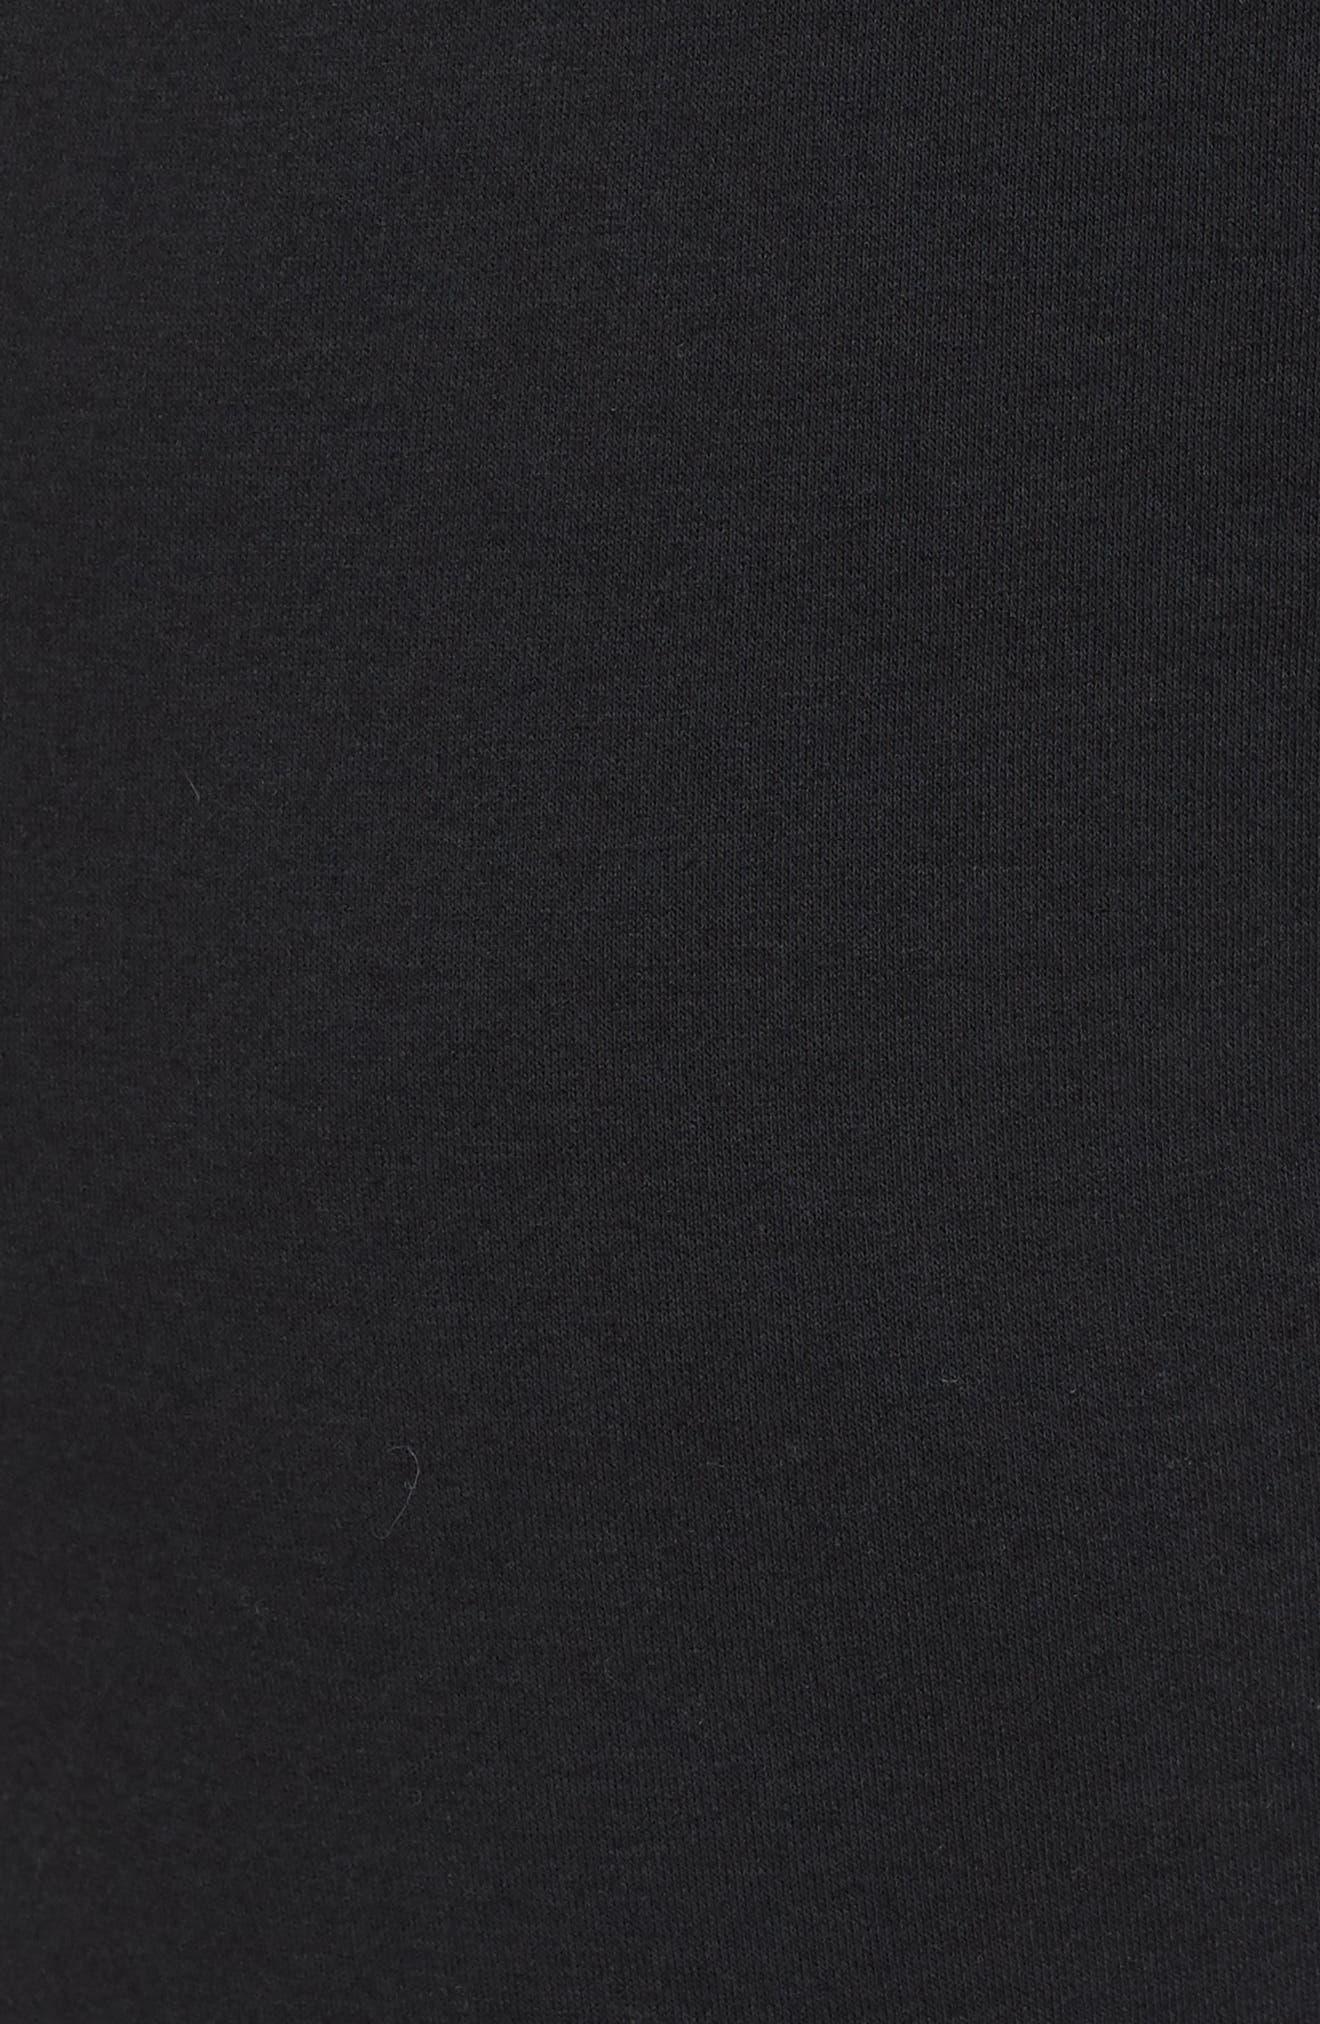 NIKE, Sportswear Rally High Rise Jogger Pants, Alternate thumbnail 6, color, BLACK/ BLACK/ WHITE